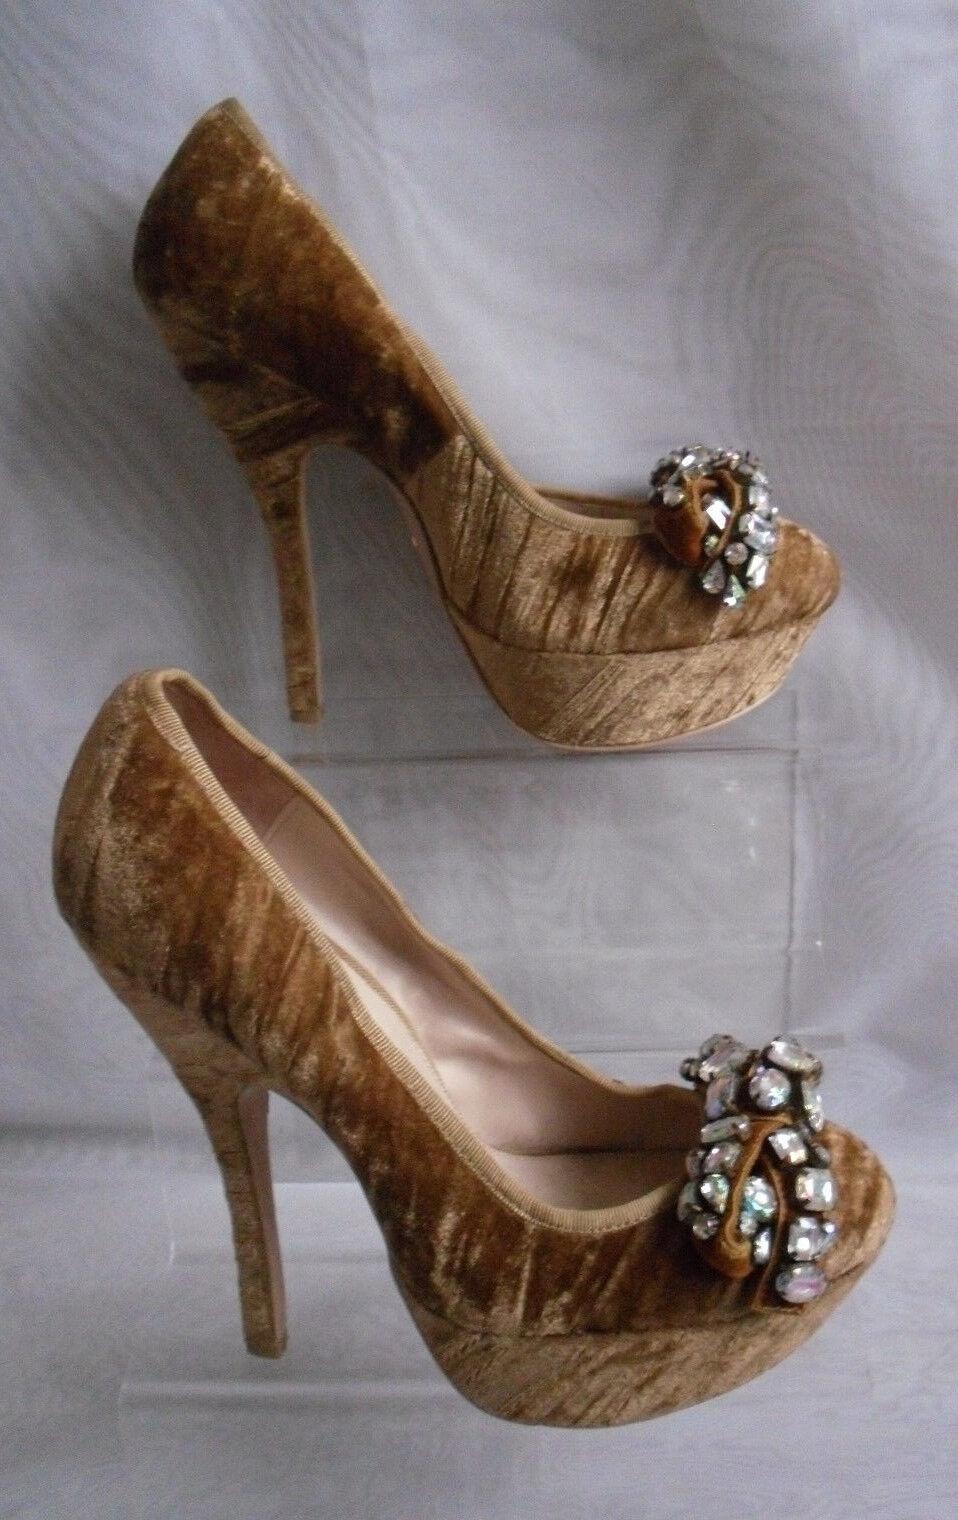 Kg-Kurt Geiger para Mujer Beis Terciopelo Terciopelo Terciopelo Delgado Tacón Alto Tribunal Zapatos Talla  5 38 (WHS209)  bajo precio del 40%